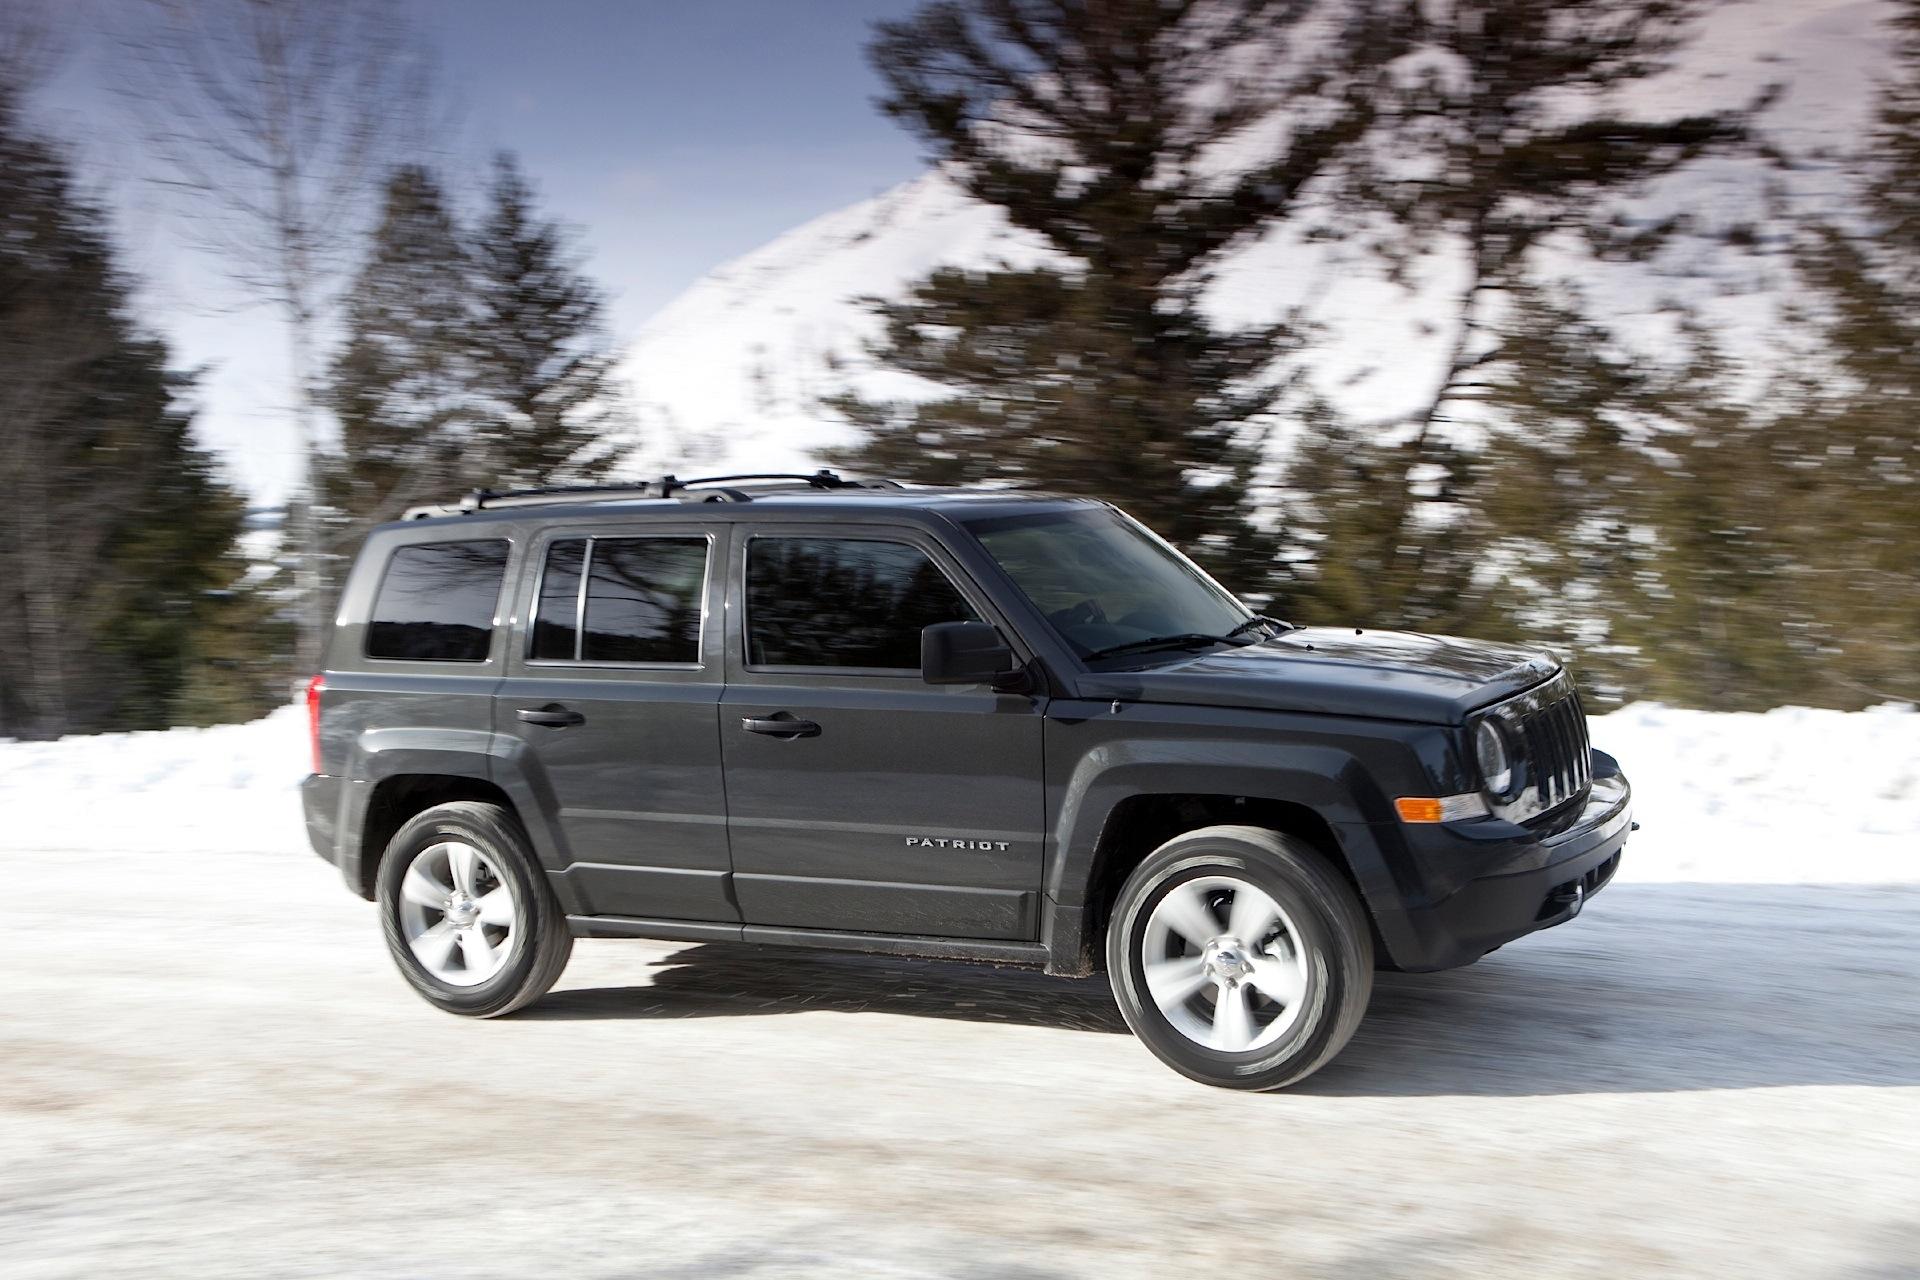 jeep patriot 2007 2008 2009 2010 2011 2012 2013 2014 autoevolution. Black Bedroom Furniture Sets. Home Design Ideas